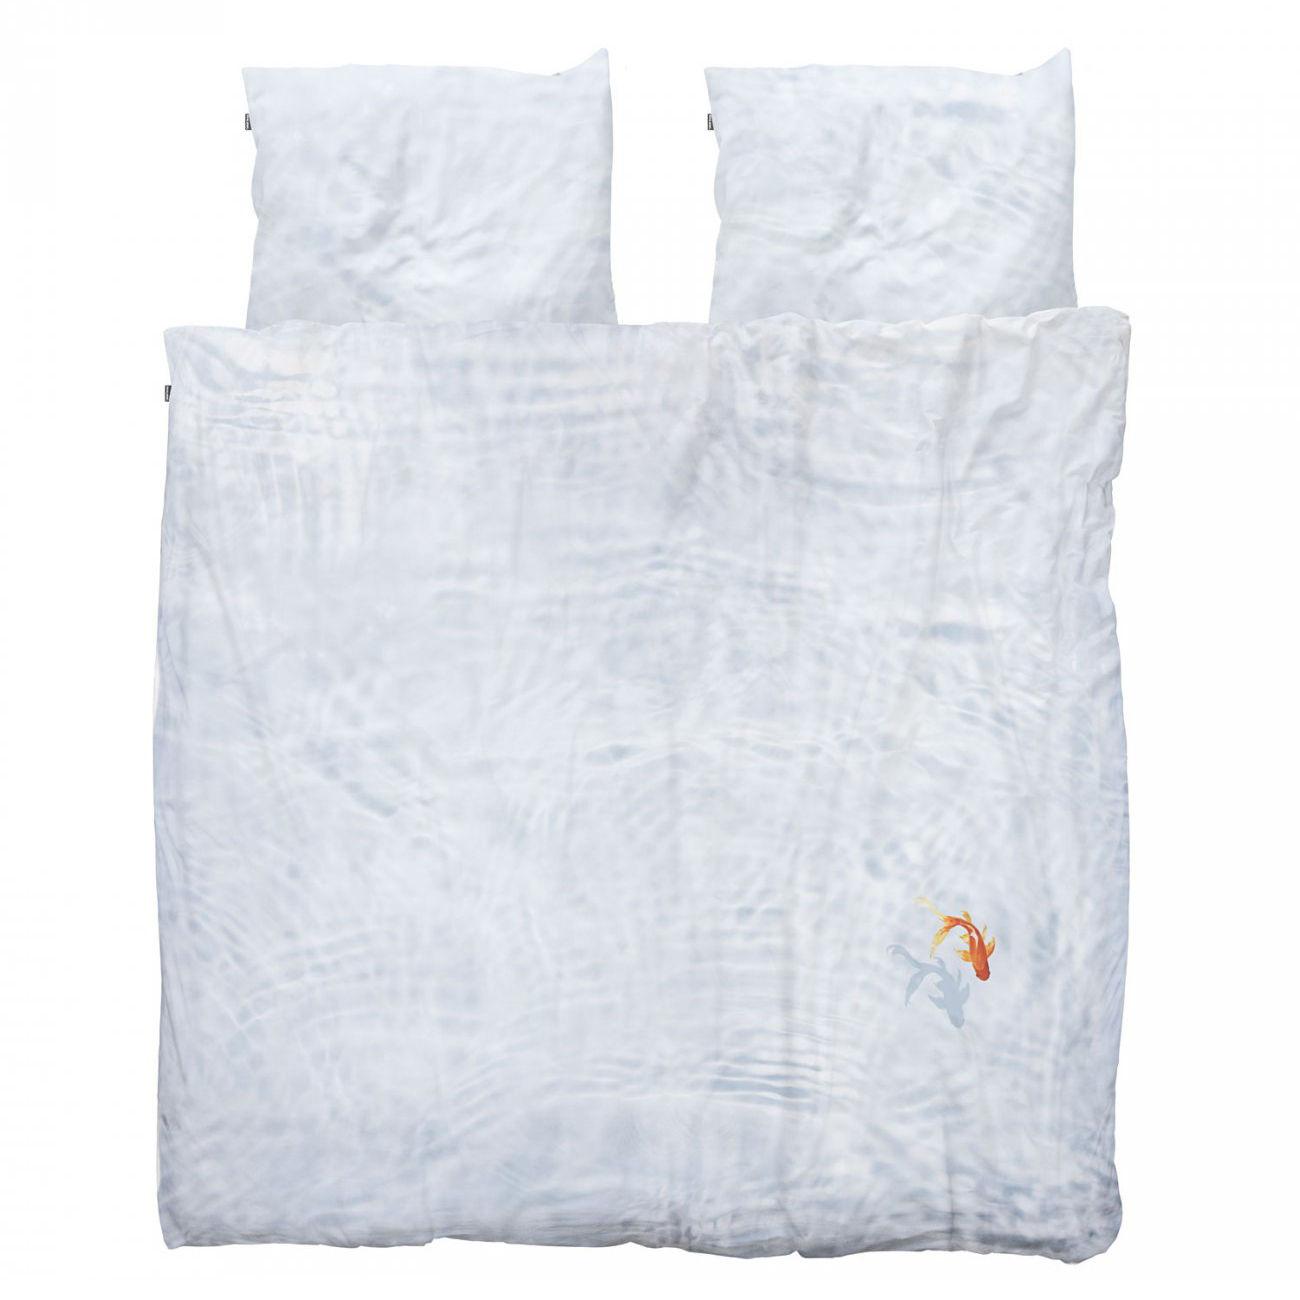 Decoration - Bedding & Bath Towels - Bassie Bedlinen set for 2 people - 2 people / W 235 x L 220 cm by Snurk - Bassie - Cotton percale